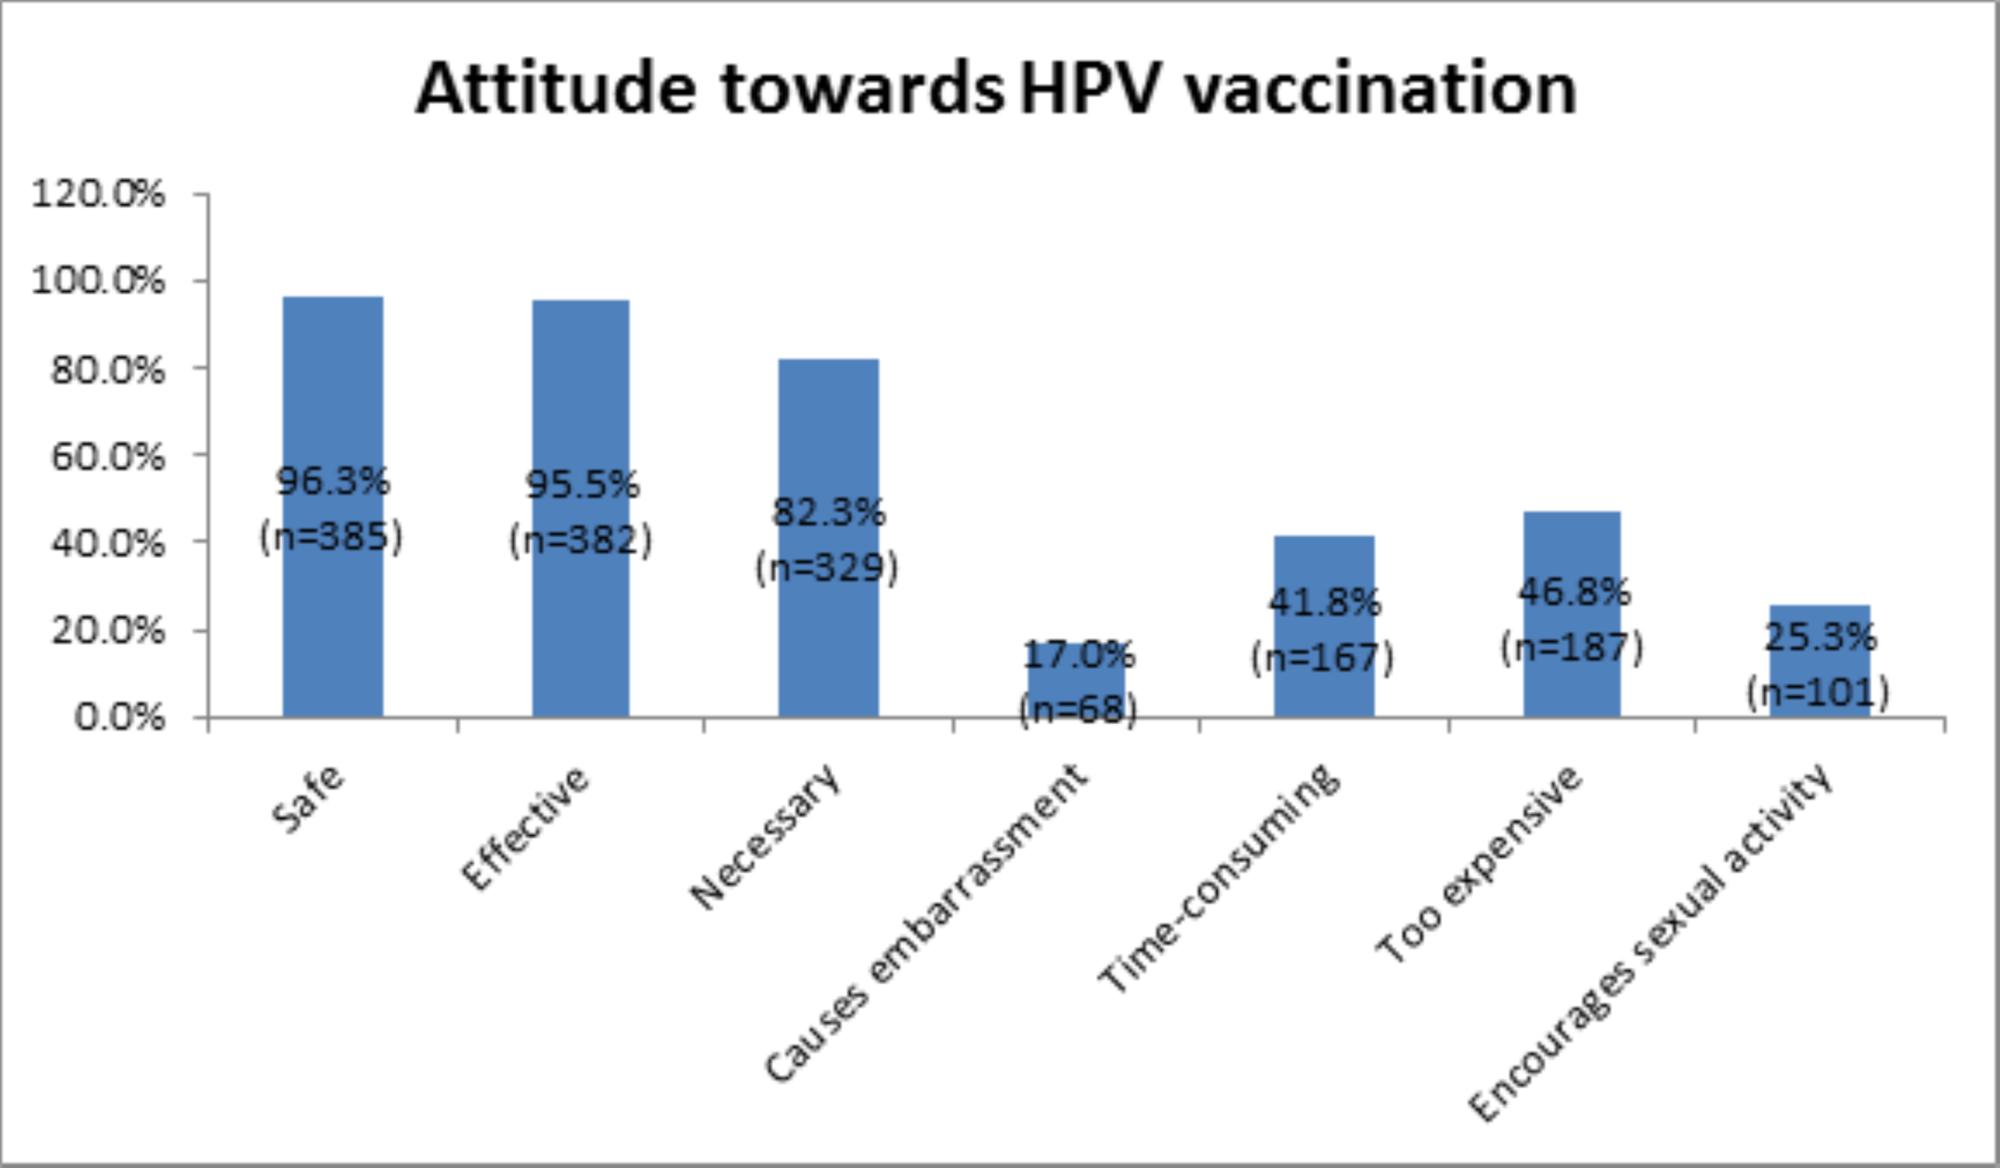 human papillomavirus vaccine statistics diarree 9 weken